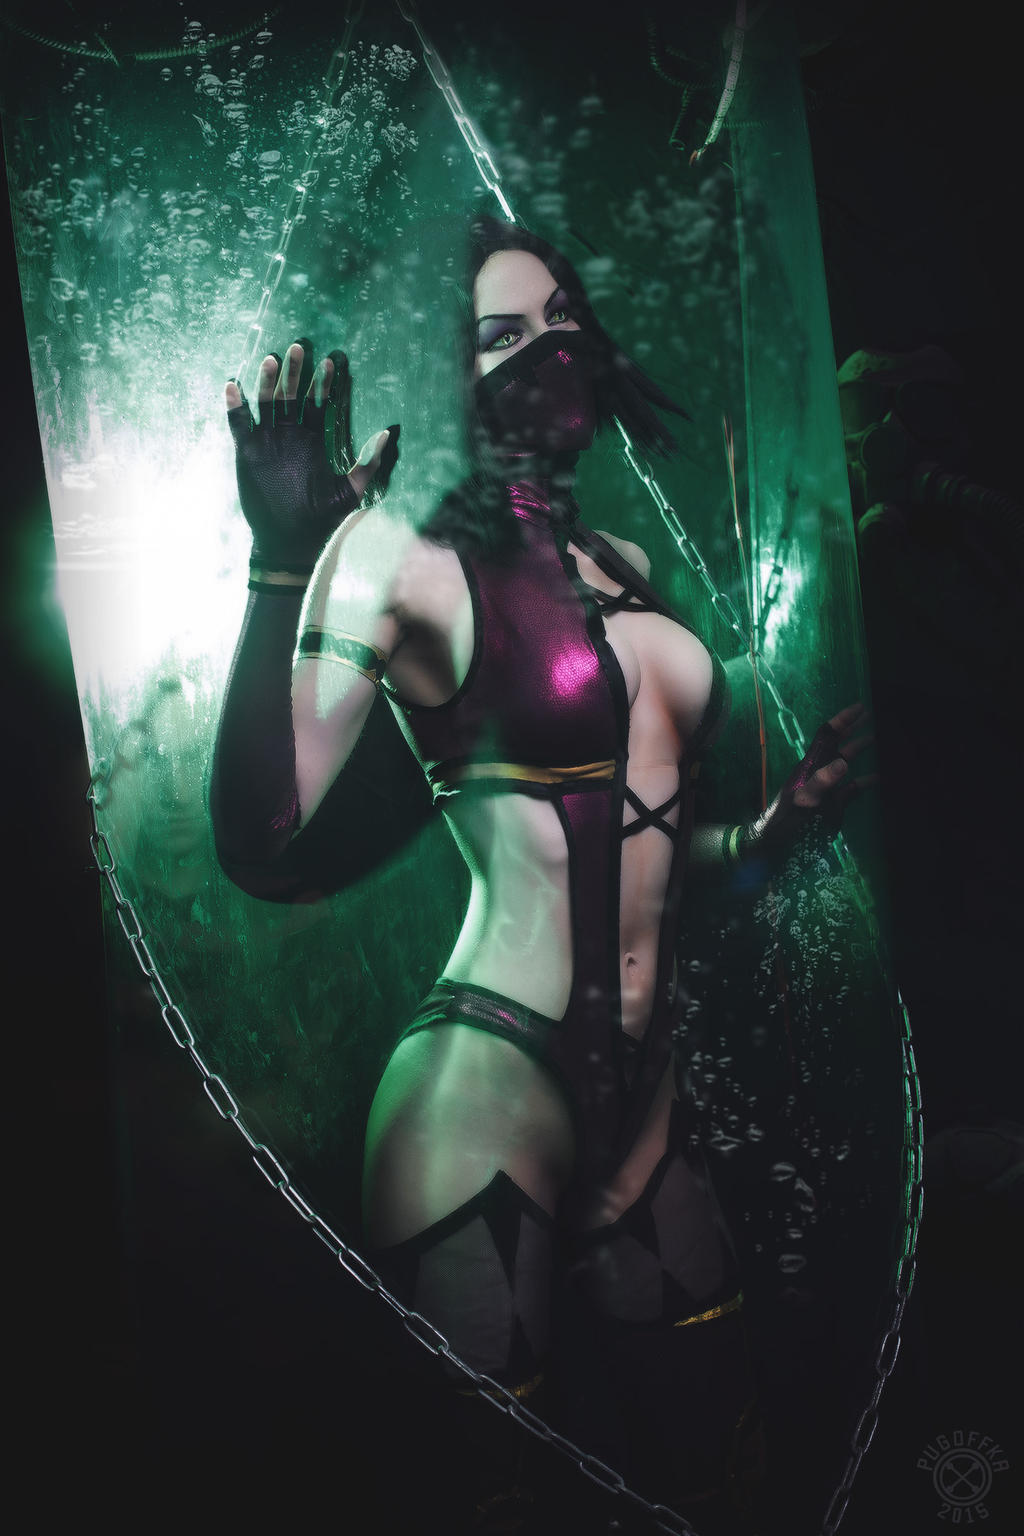 mileena_mortal_kombat_9_cosplay_by_asherwarr-d99o1lk.jpg